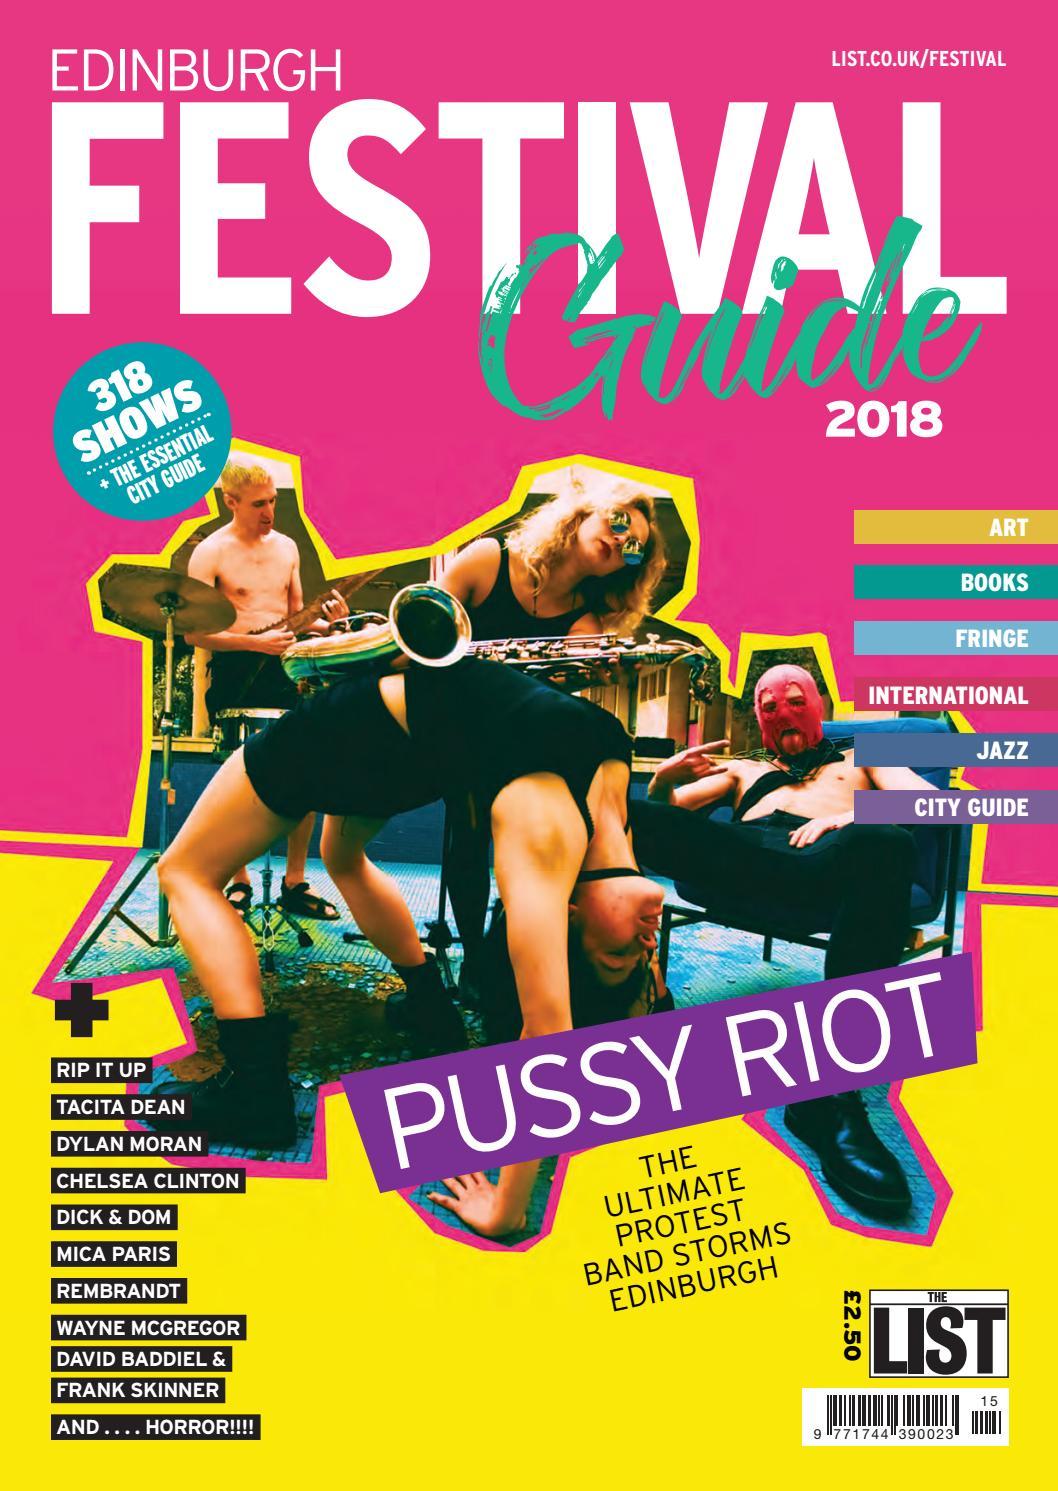 Edinburgh Festival Guide 2018 by The List Ltd - issuu